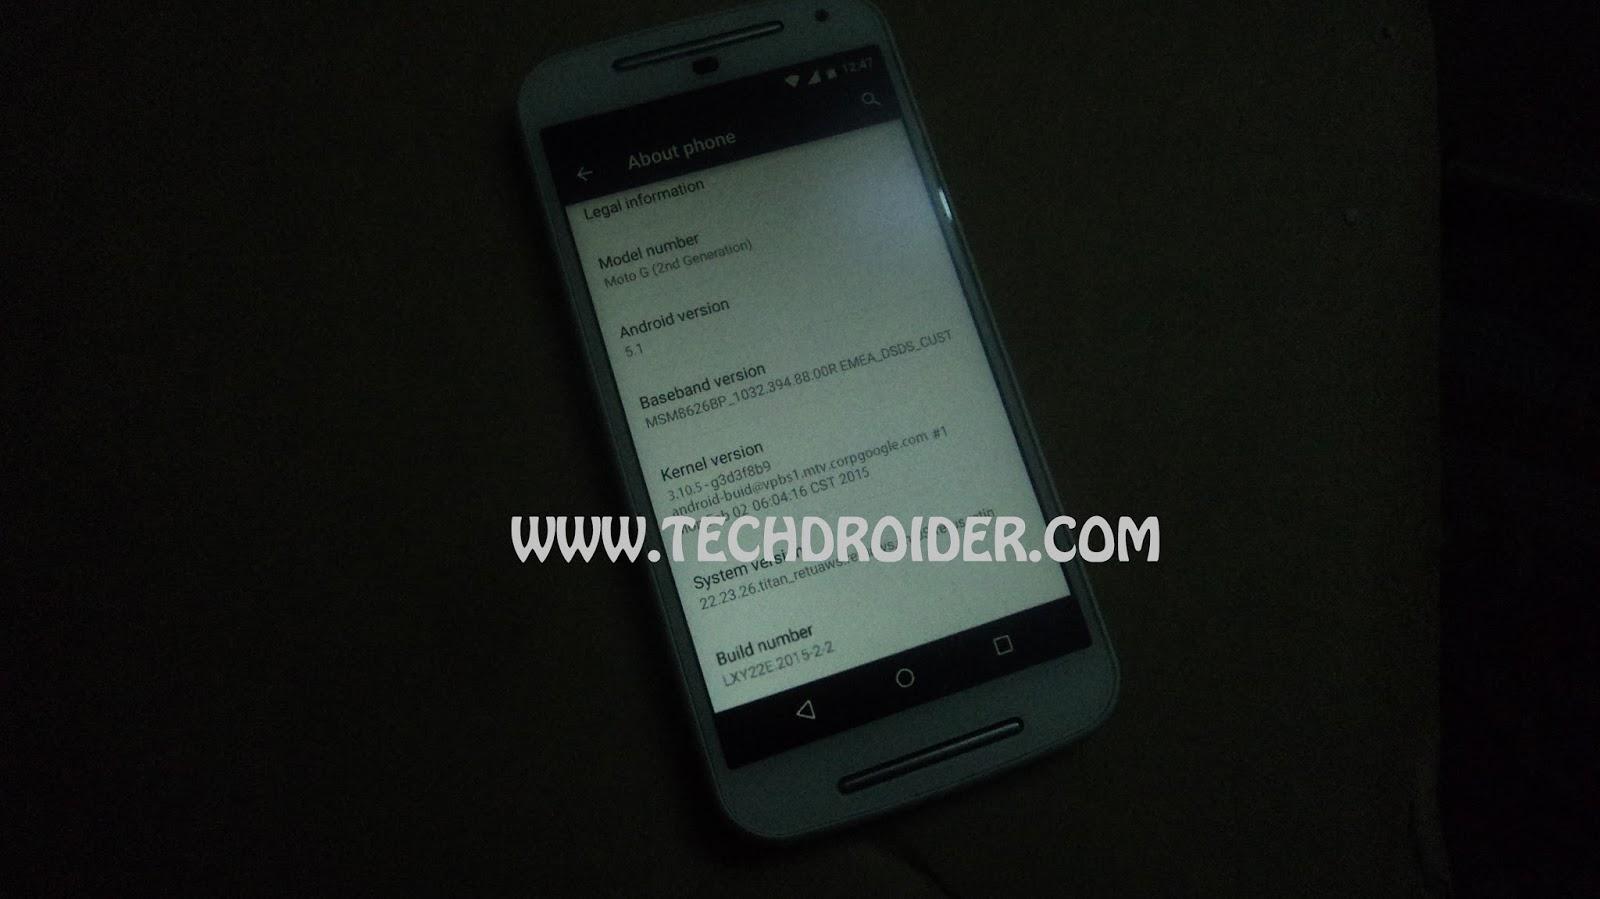 Moto G 2014 com Android 5.1? 1